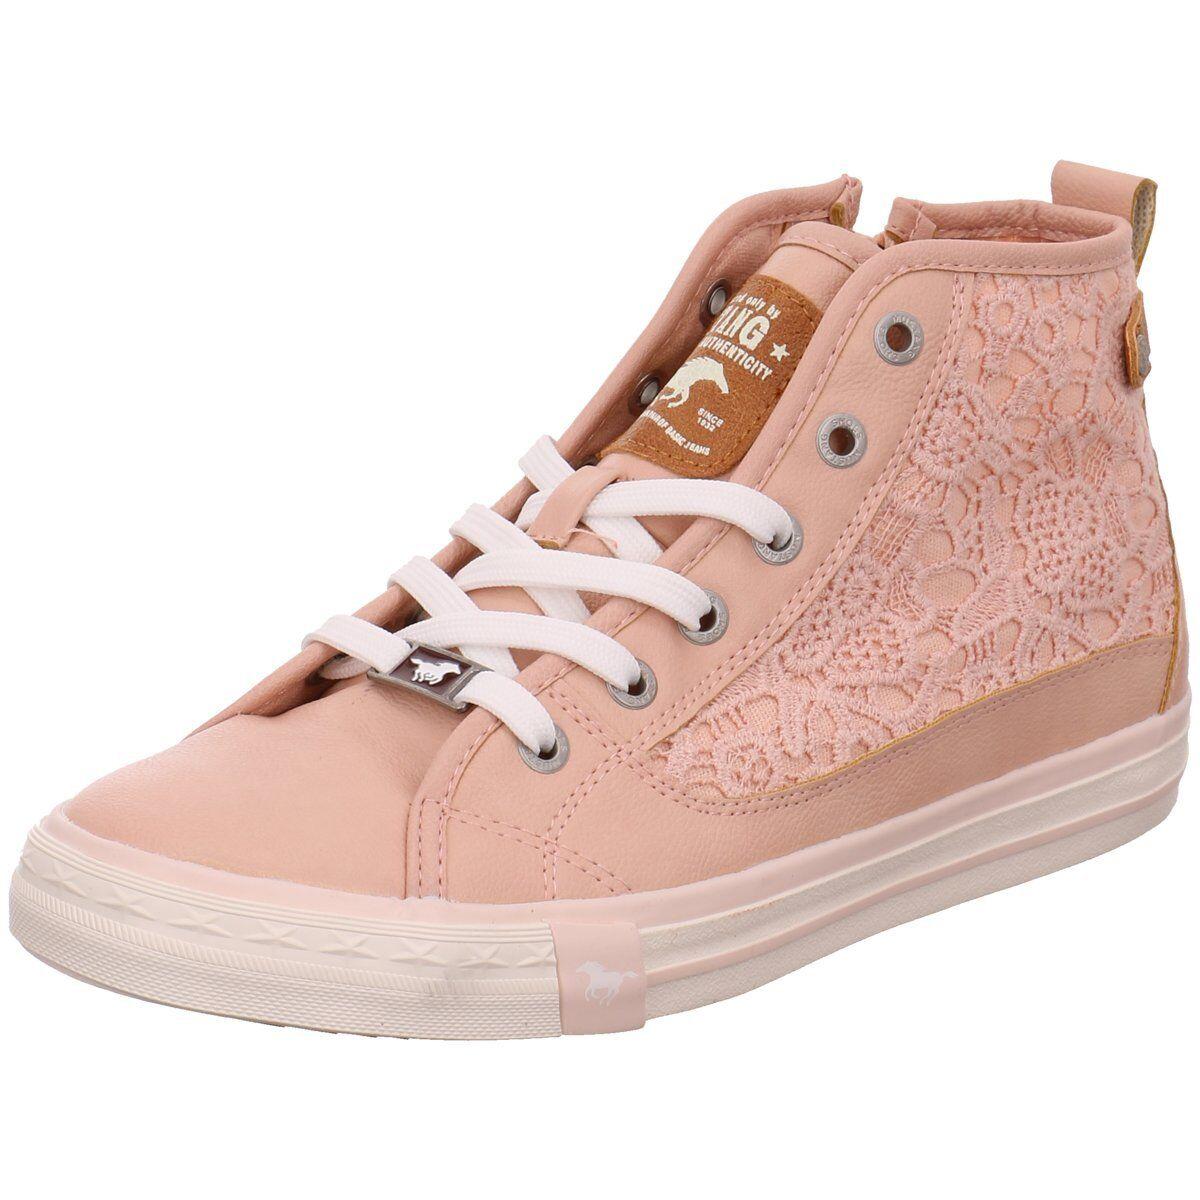 NEU rosa Mustang Damen Sneaker Schnürstiefelette Kaltfutter 5024-507-565 rosa NEU 220109 9209a5